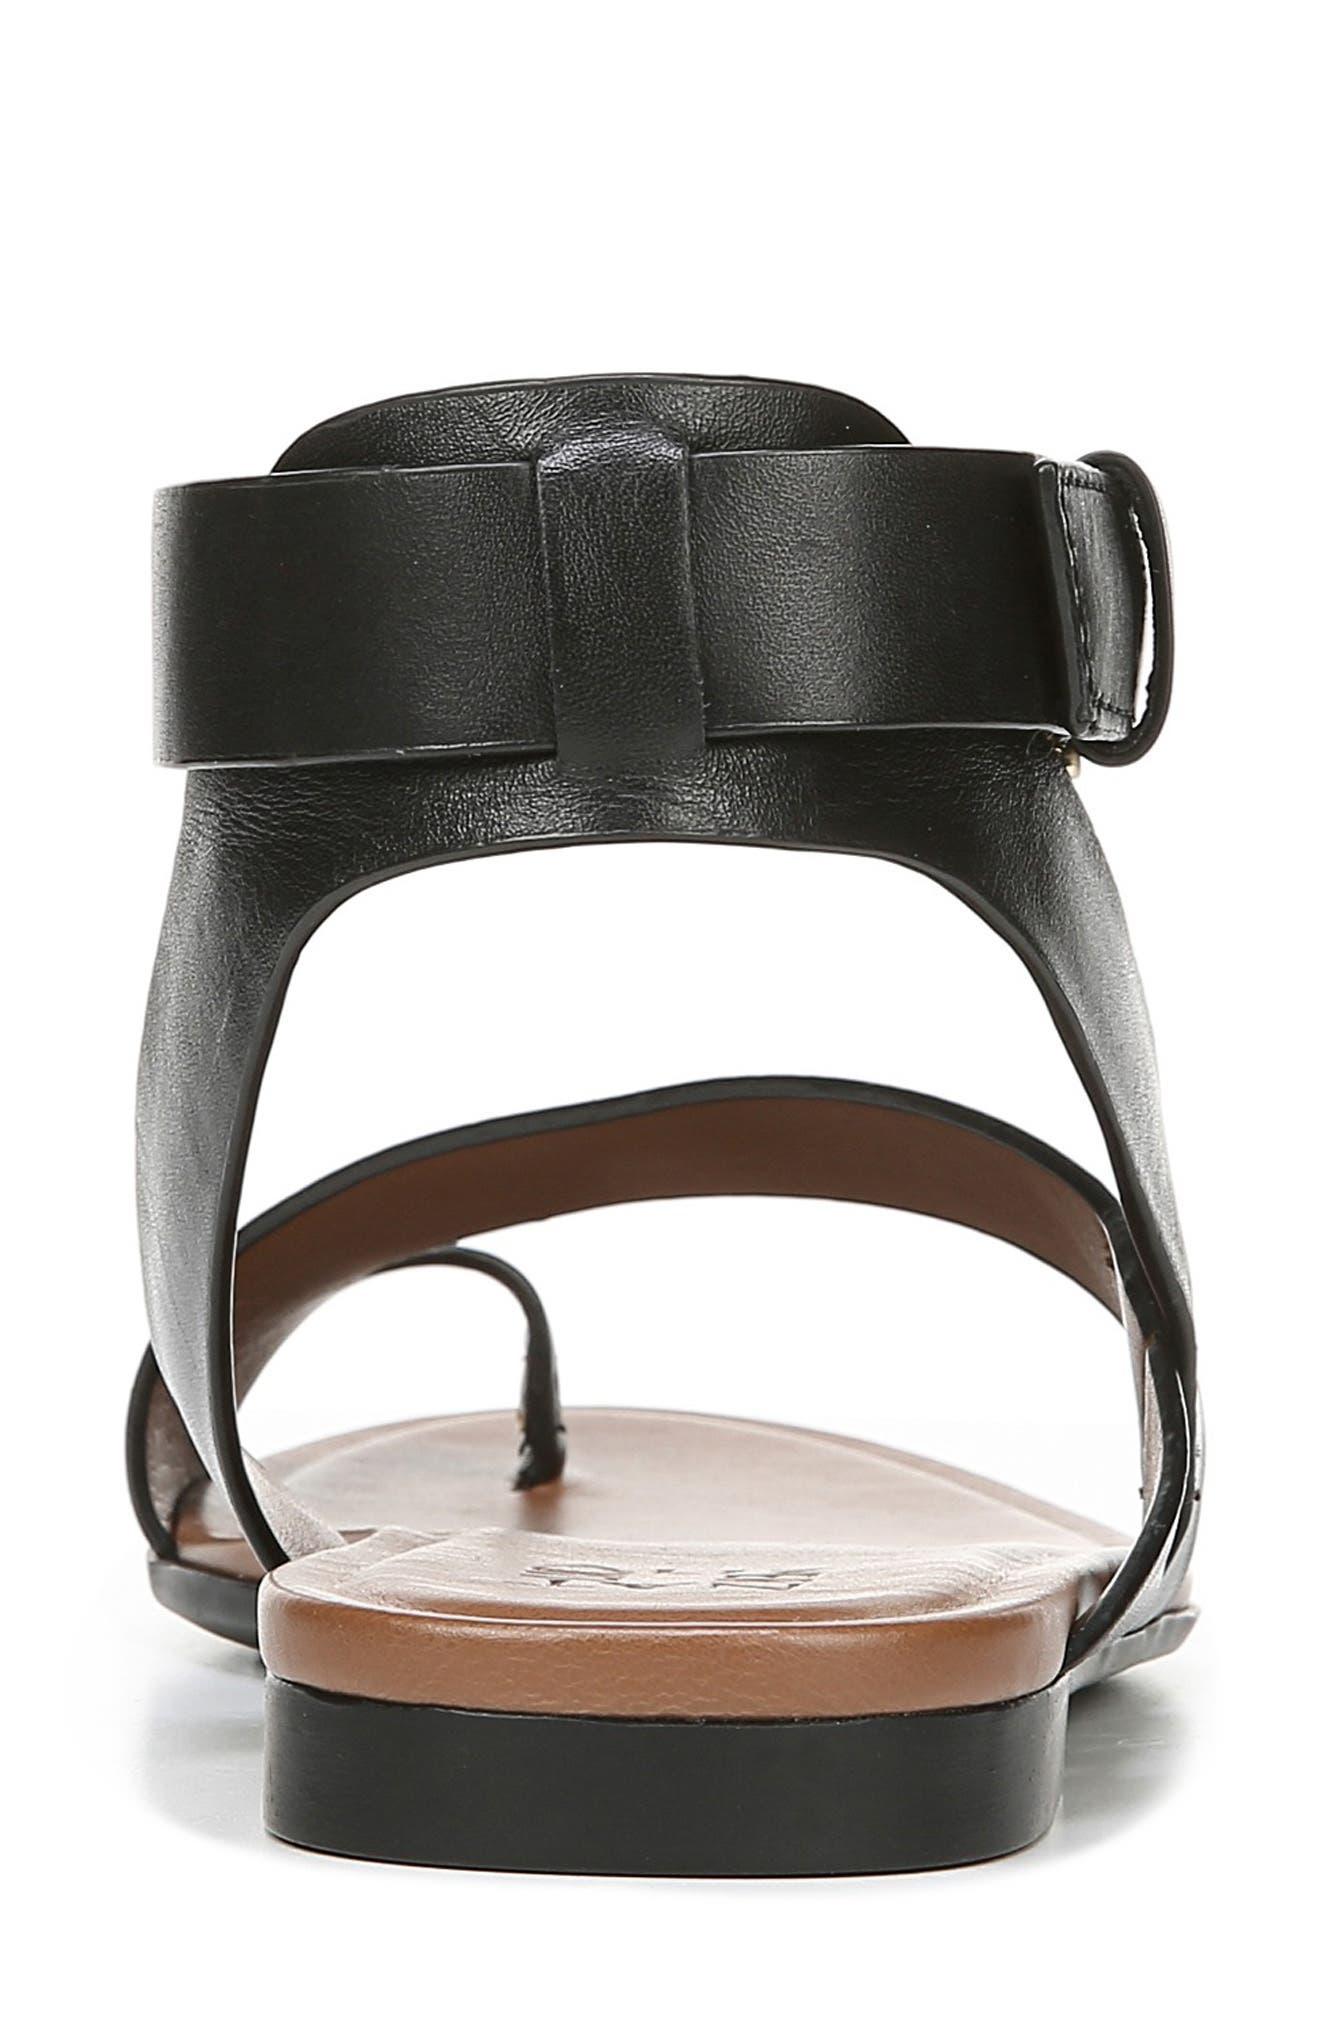 Tally Ankle Strap Sandal,                             Alternate thumbnail 7, color,                             BLACK LEATHER